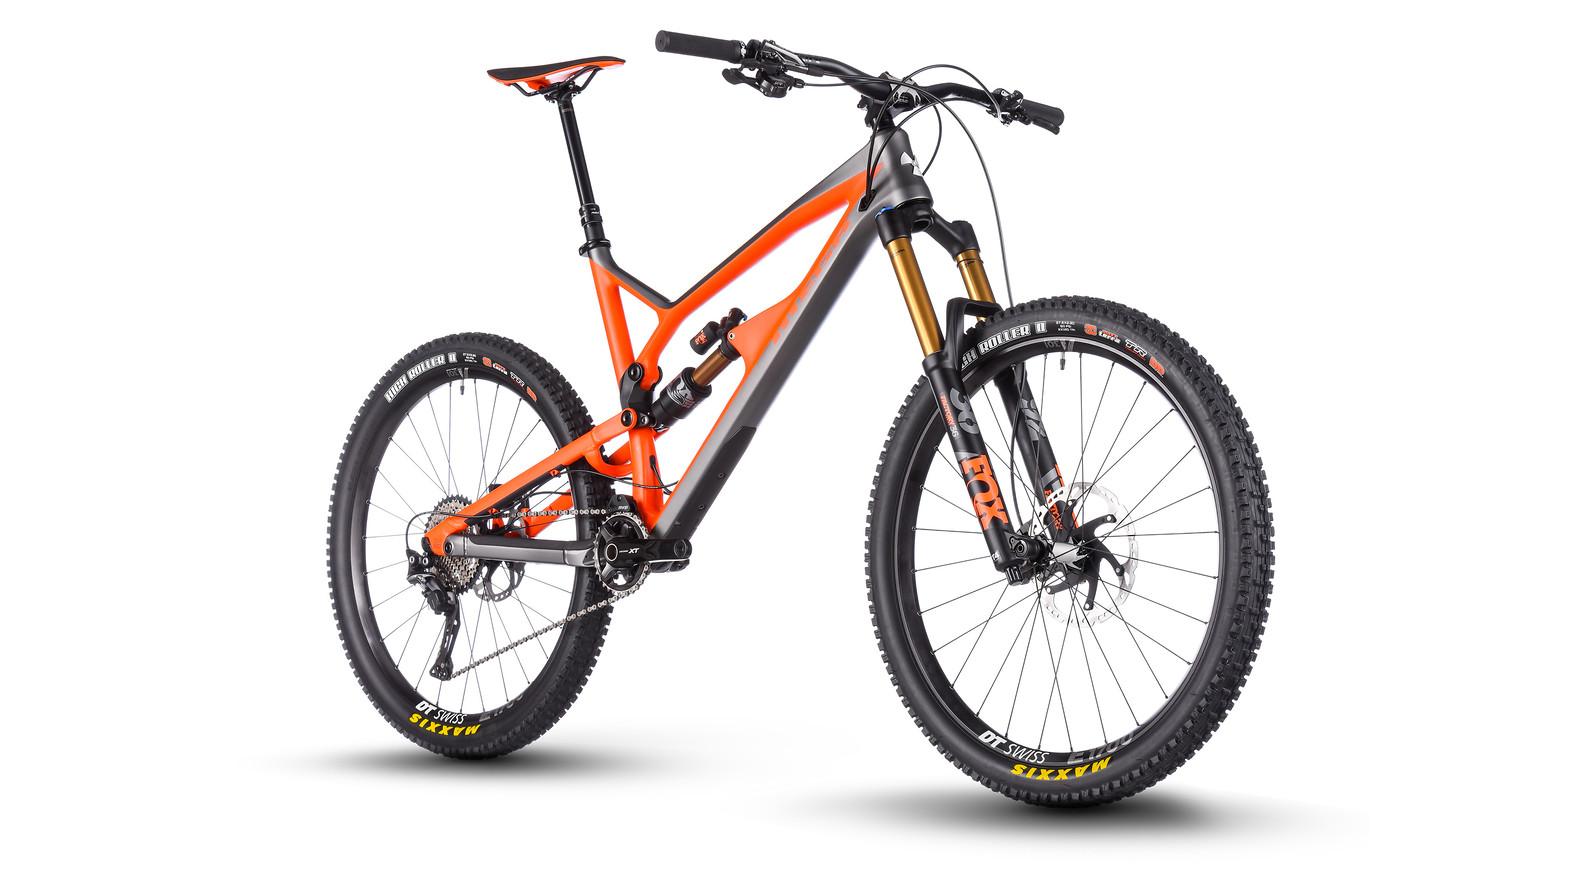 2018 Nukeproof Mega 275 Carbon Factory Bike Nukeproof Mega 275c Factory